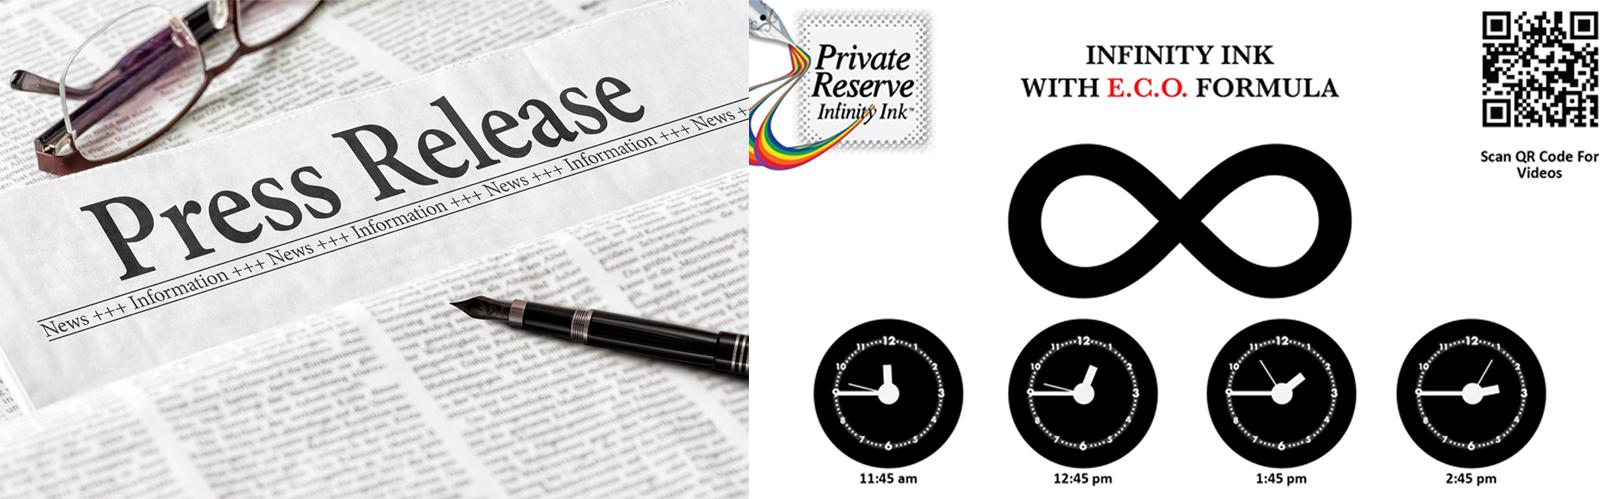 pr-infinity-banner-press-release.jpg